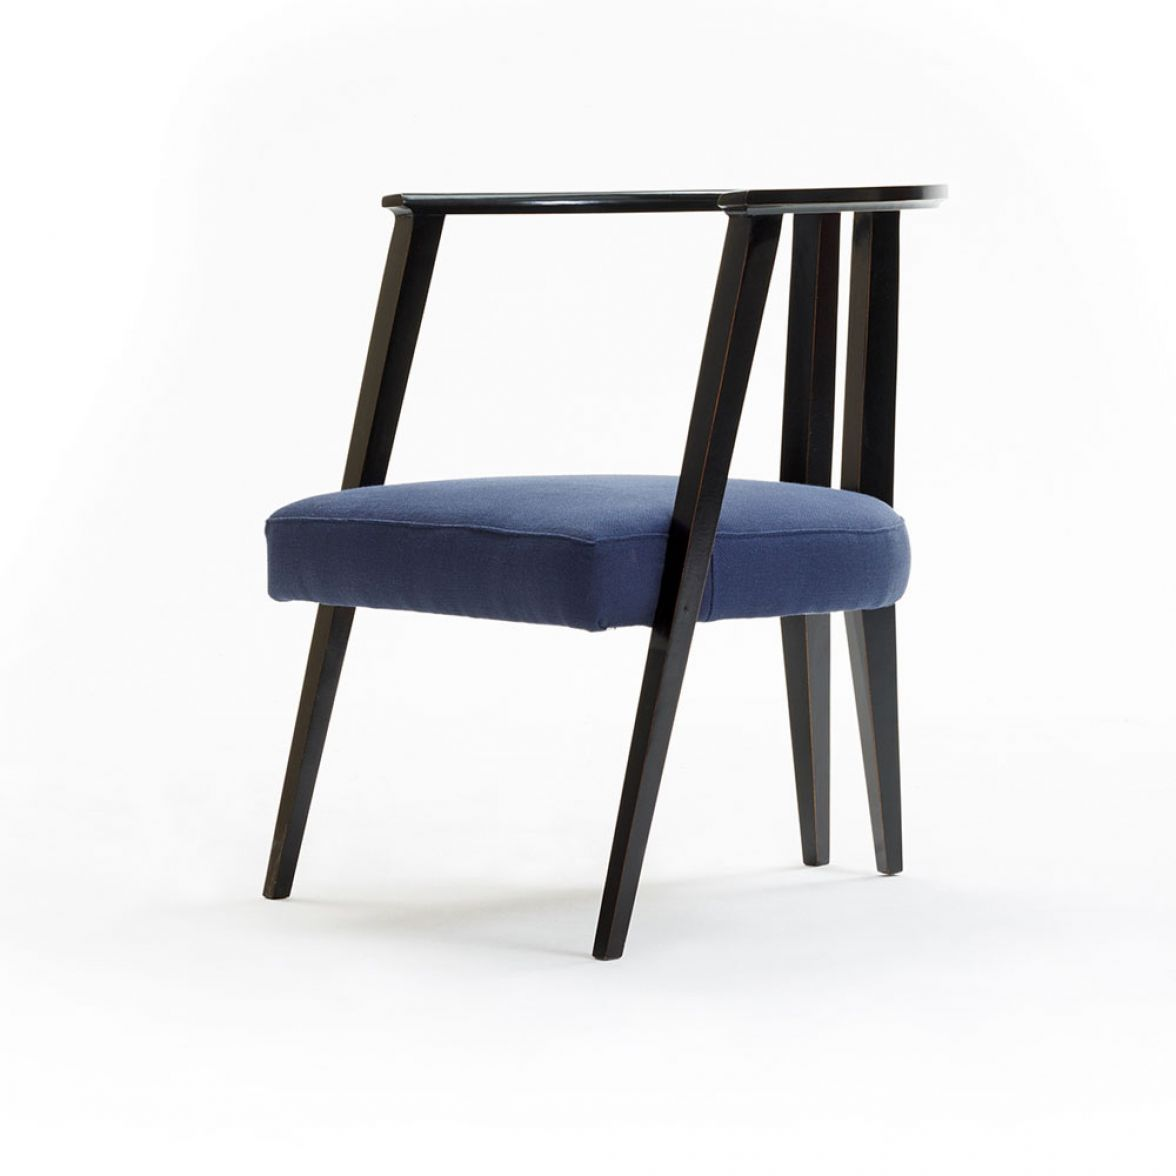 Decori armchair